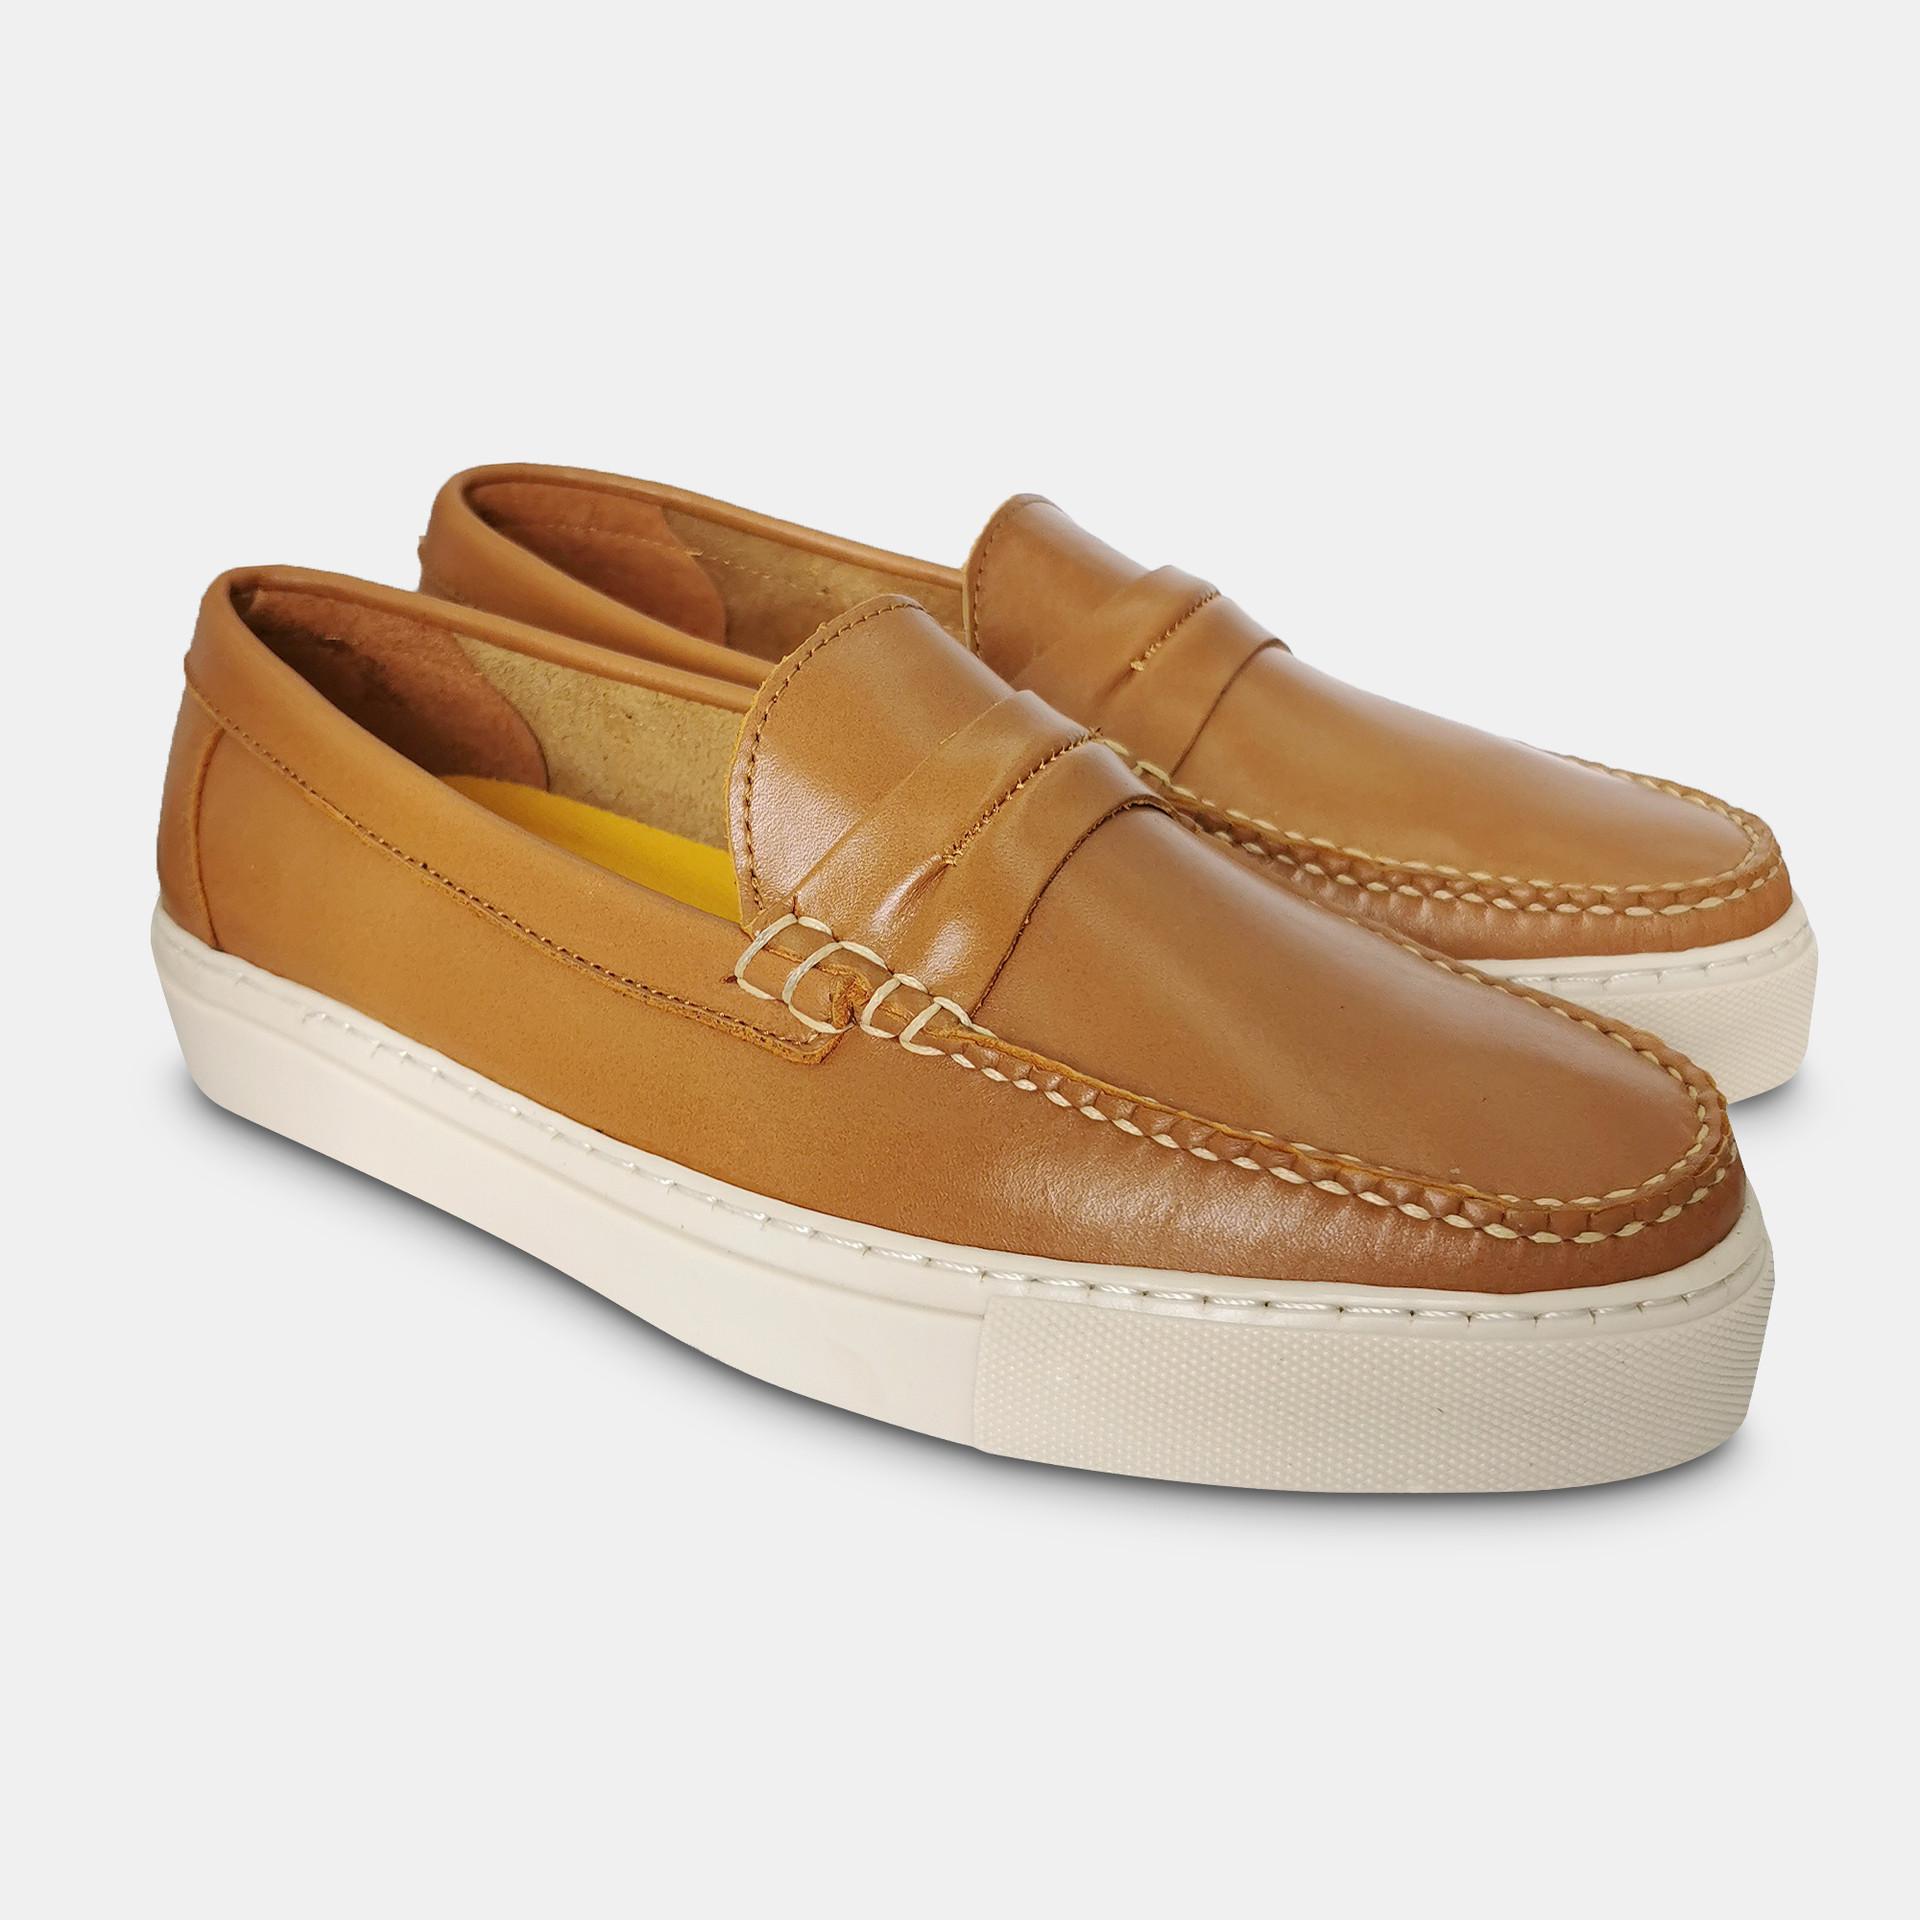 Randem-Sneaker-Spender-Miel(1).jpg